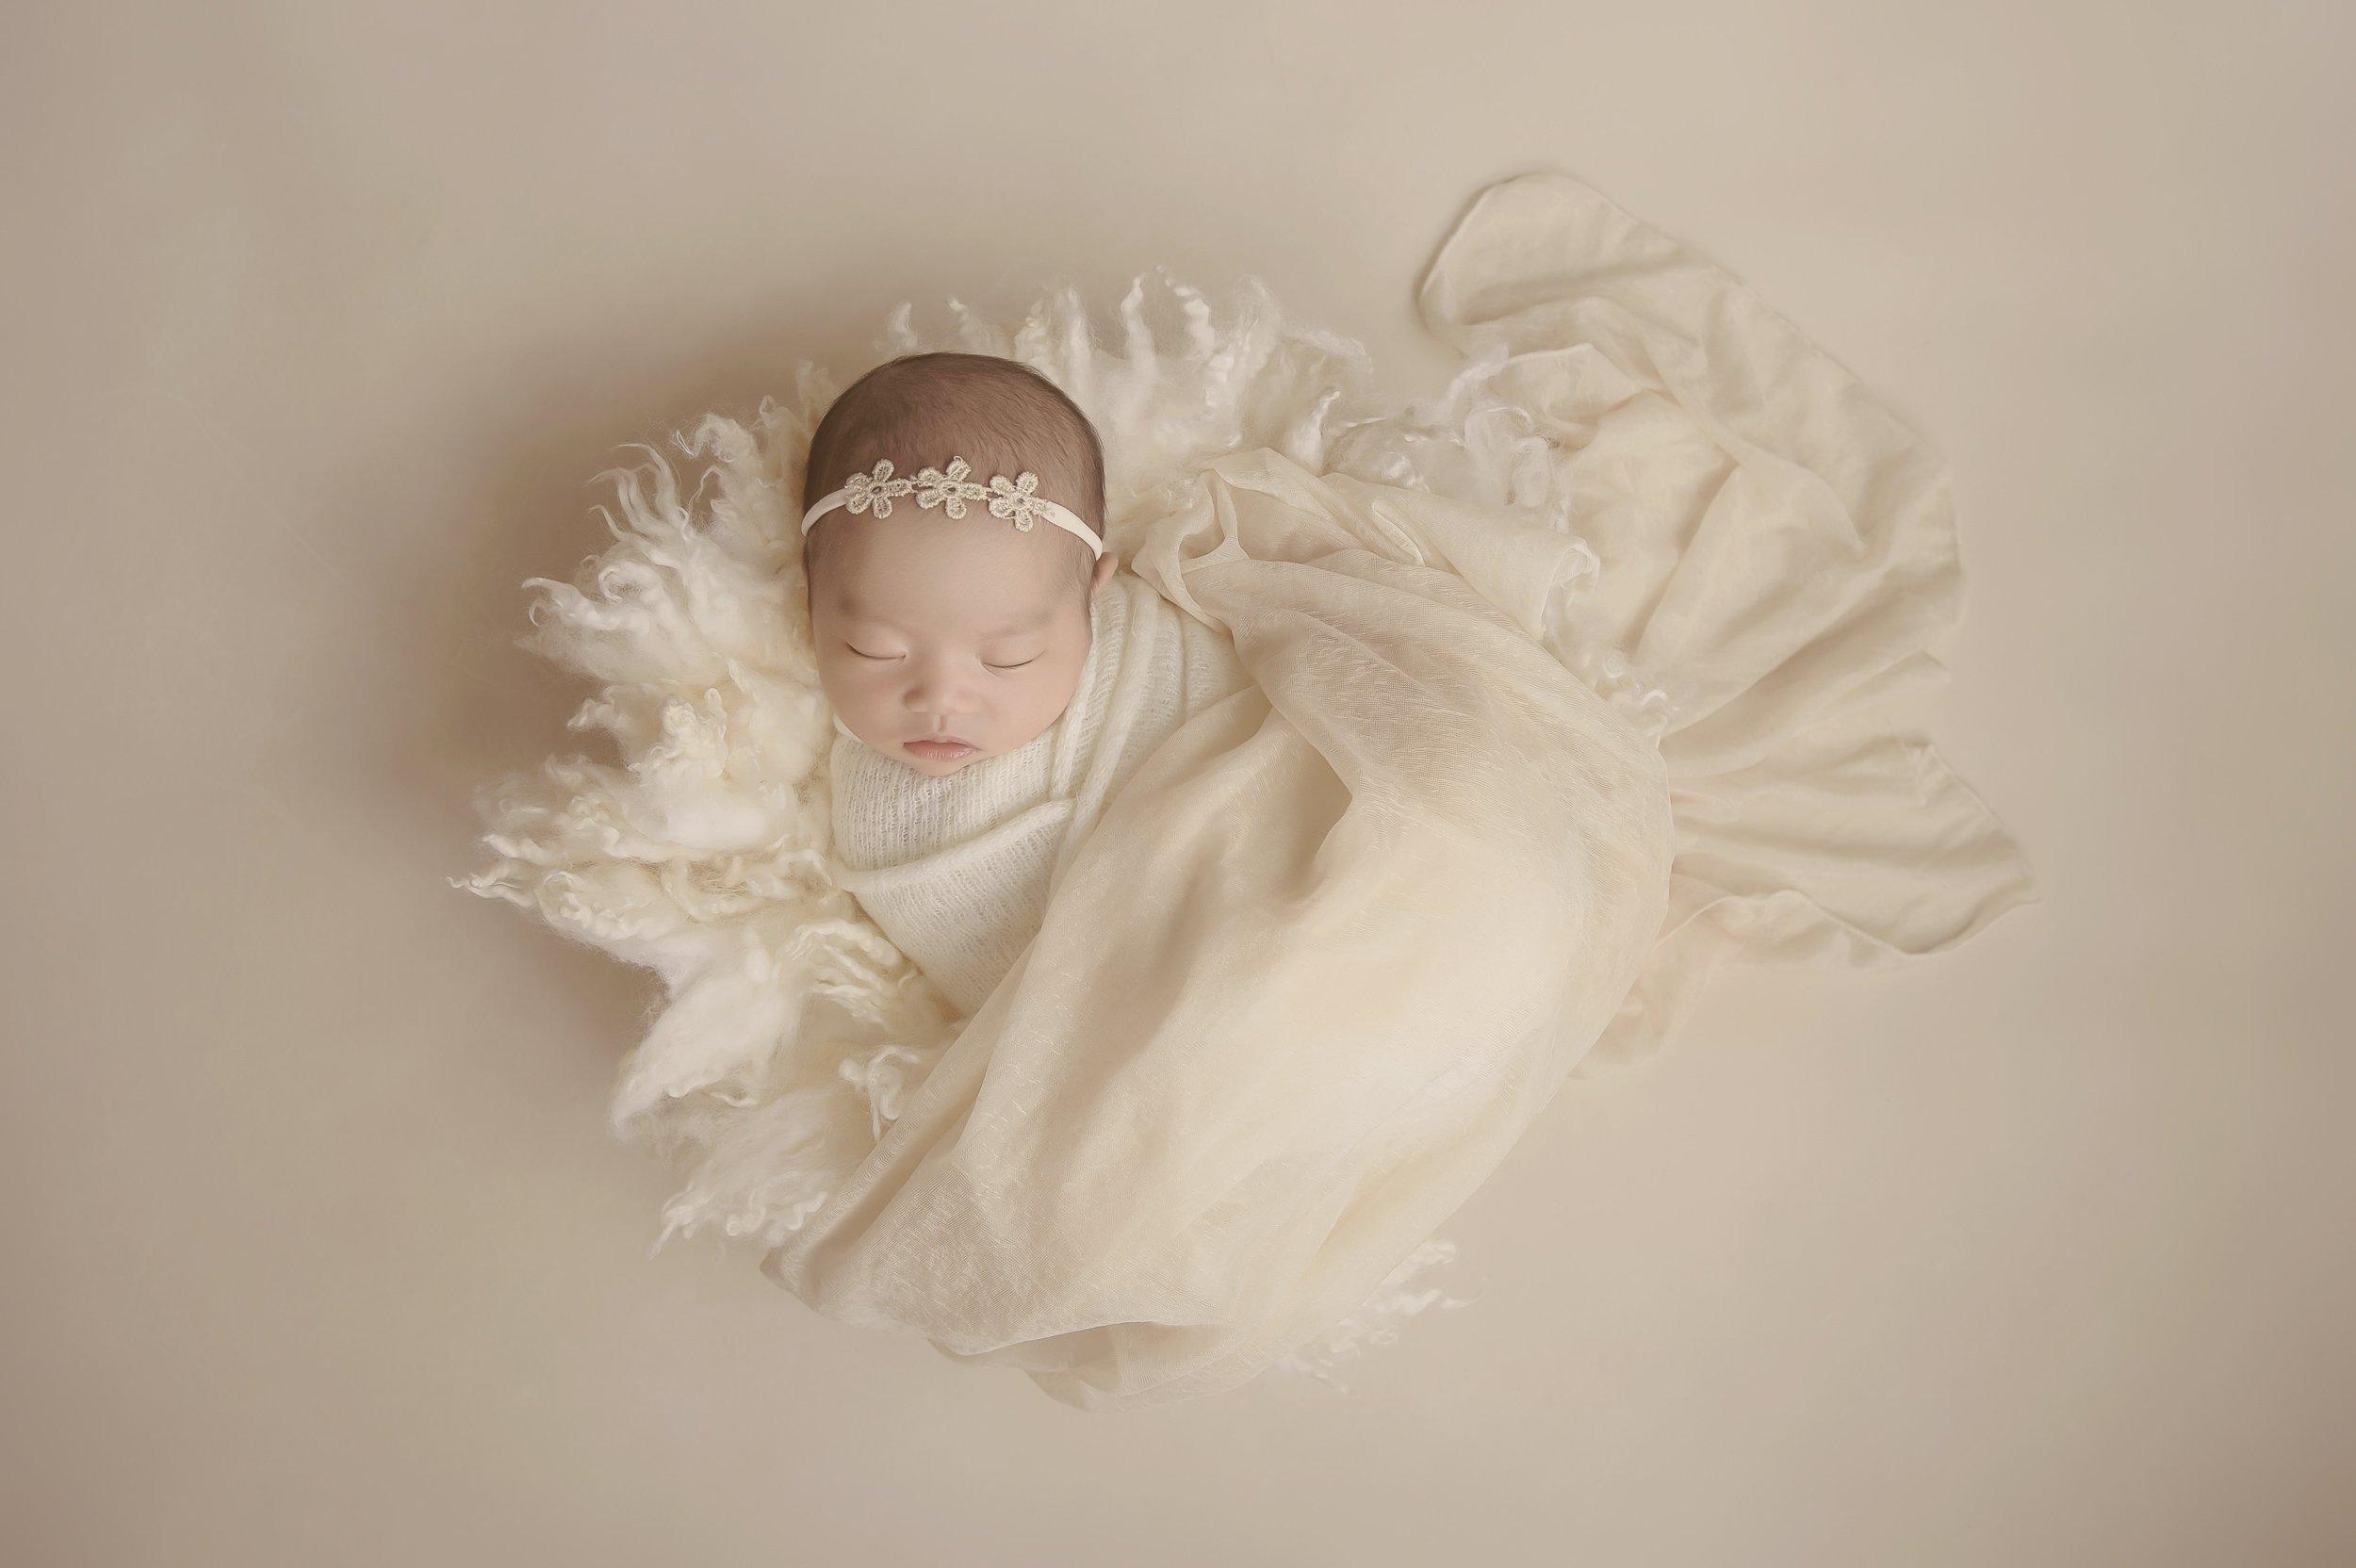 newborn girl sleeping wearing a flower headband